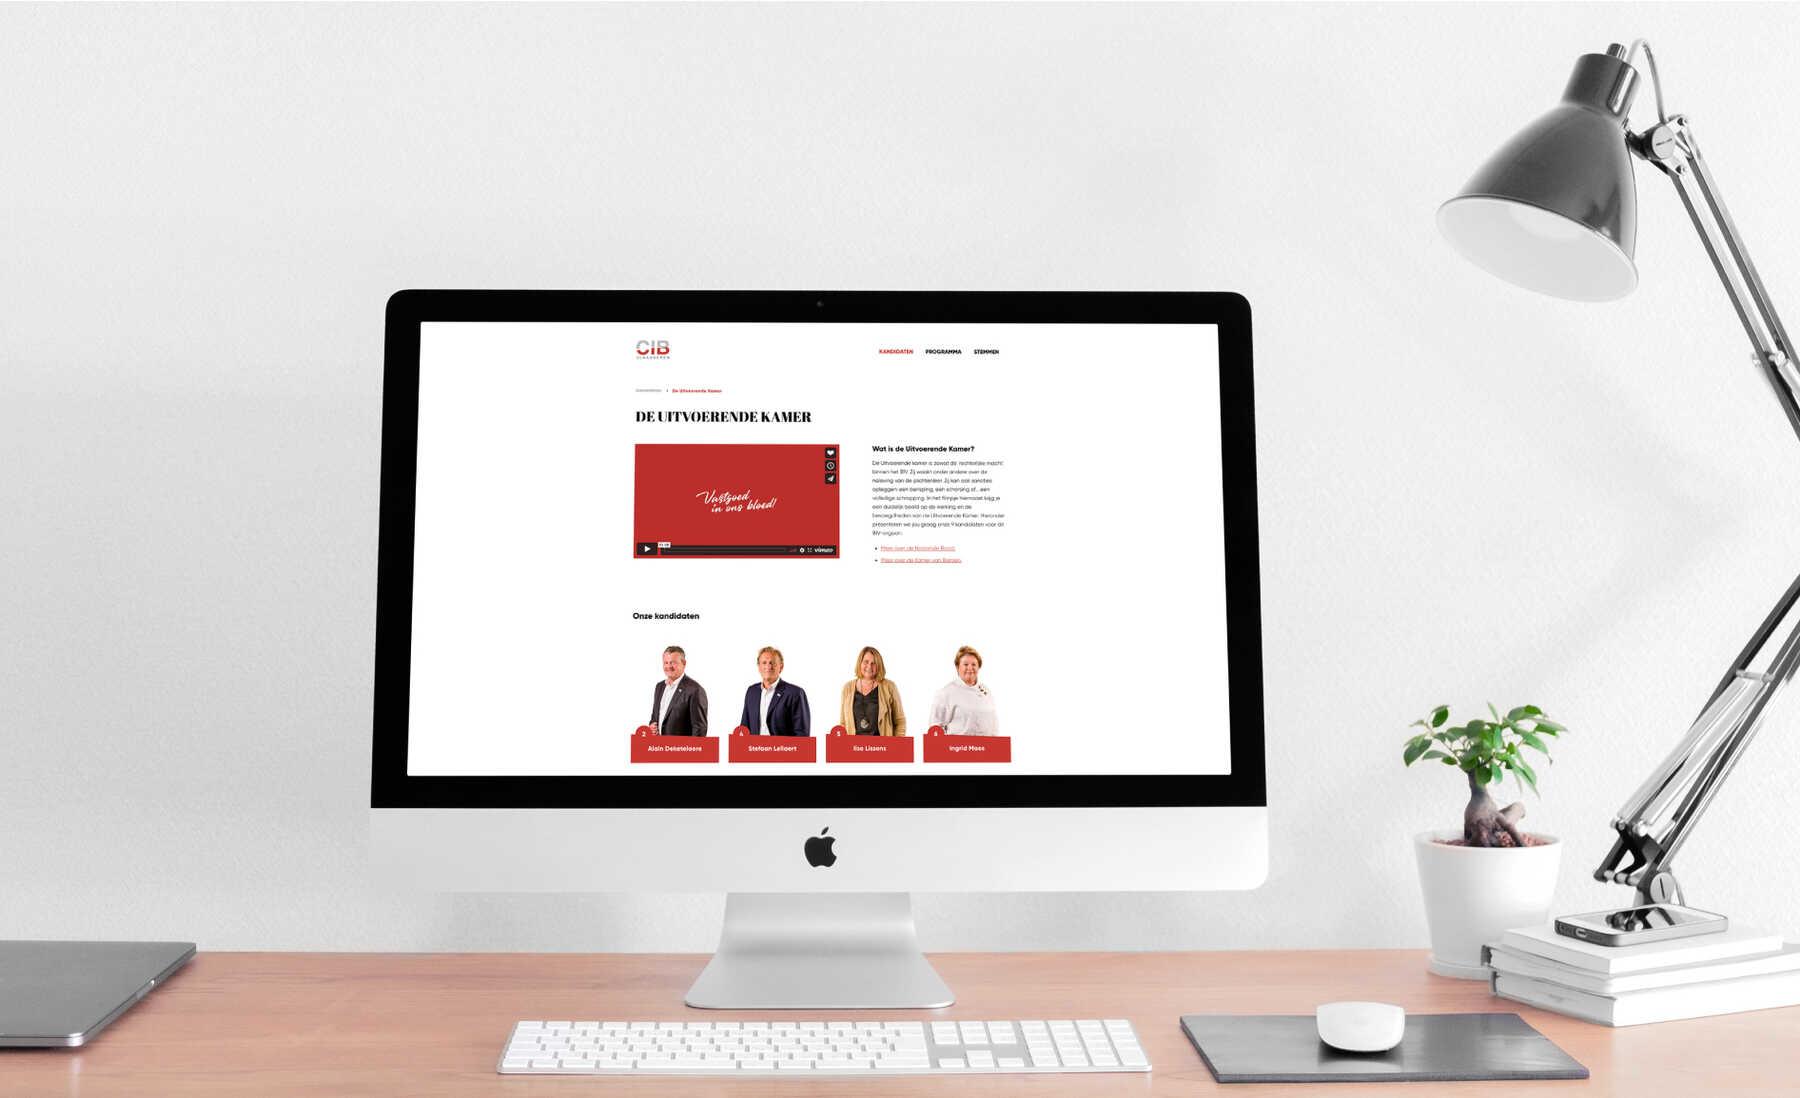 CIB Vlaanderen campagnewebsite